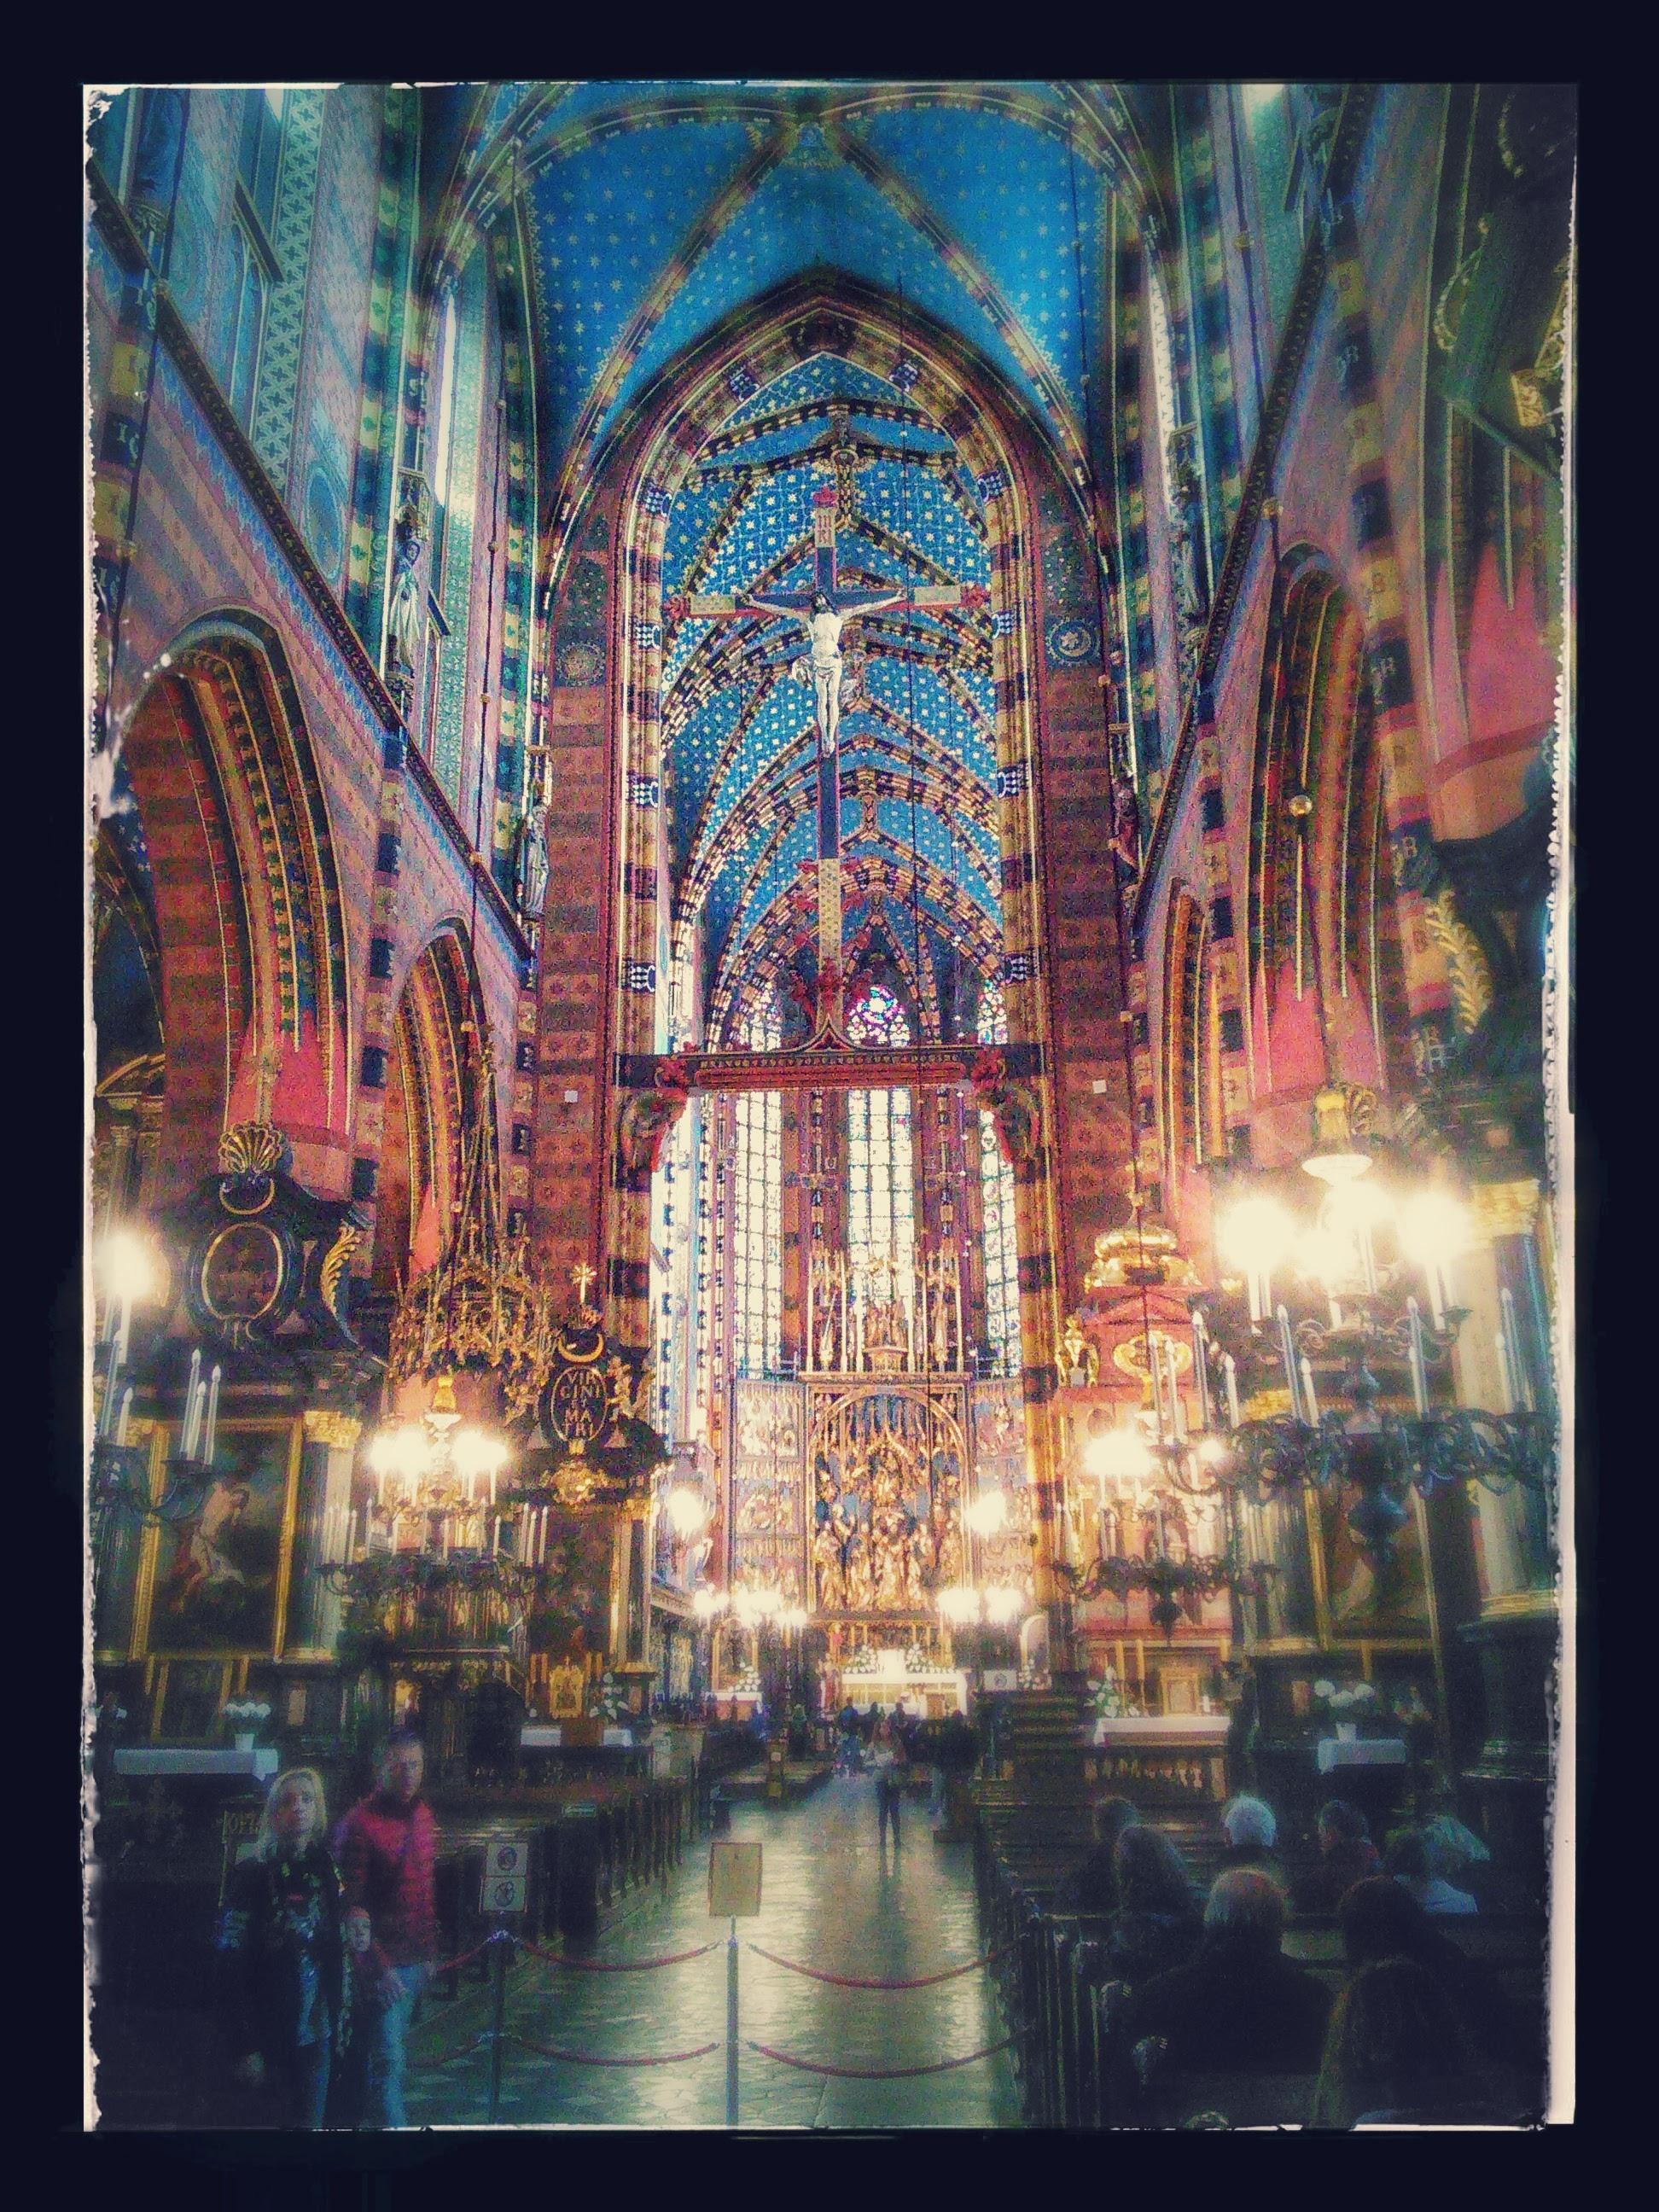 The inside of St Mary's Basilica in Krakow